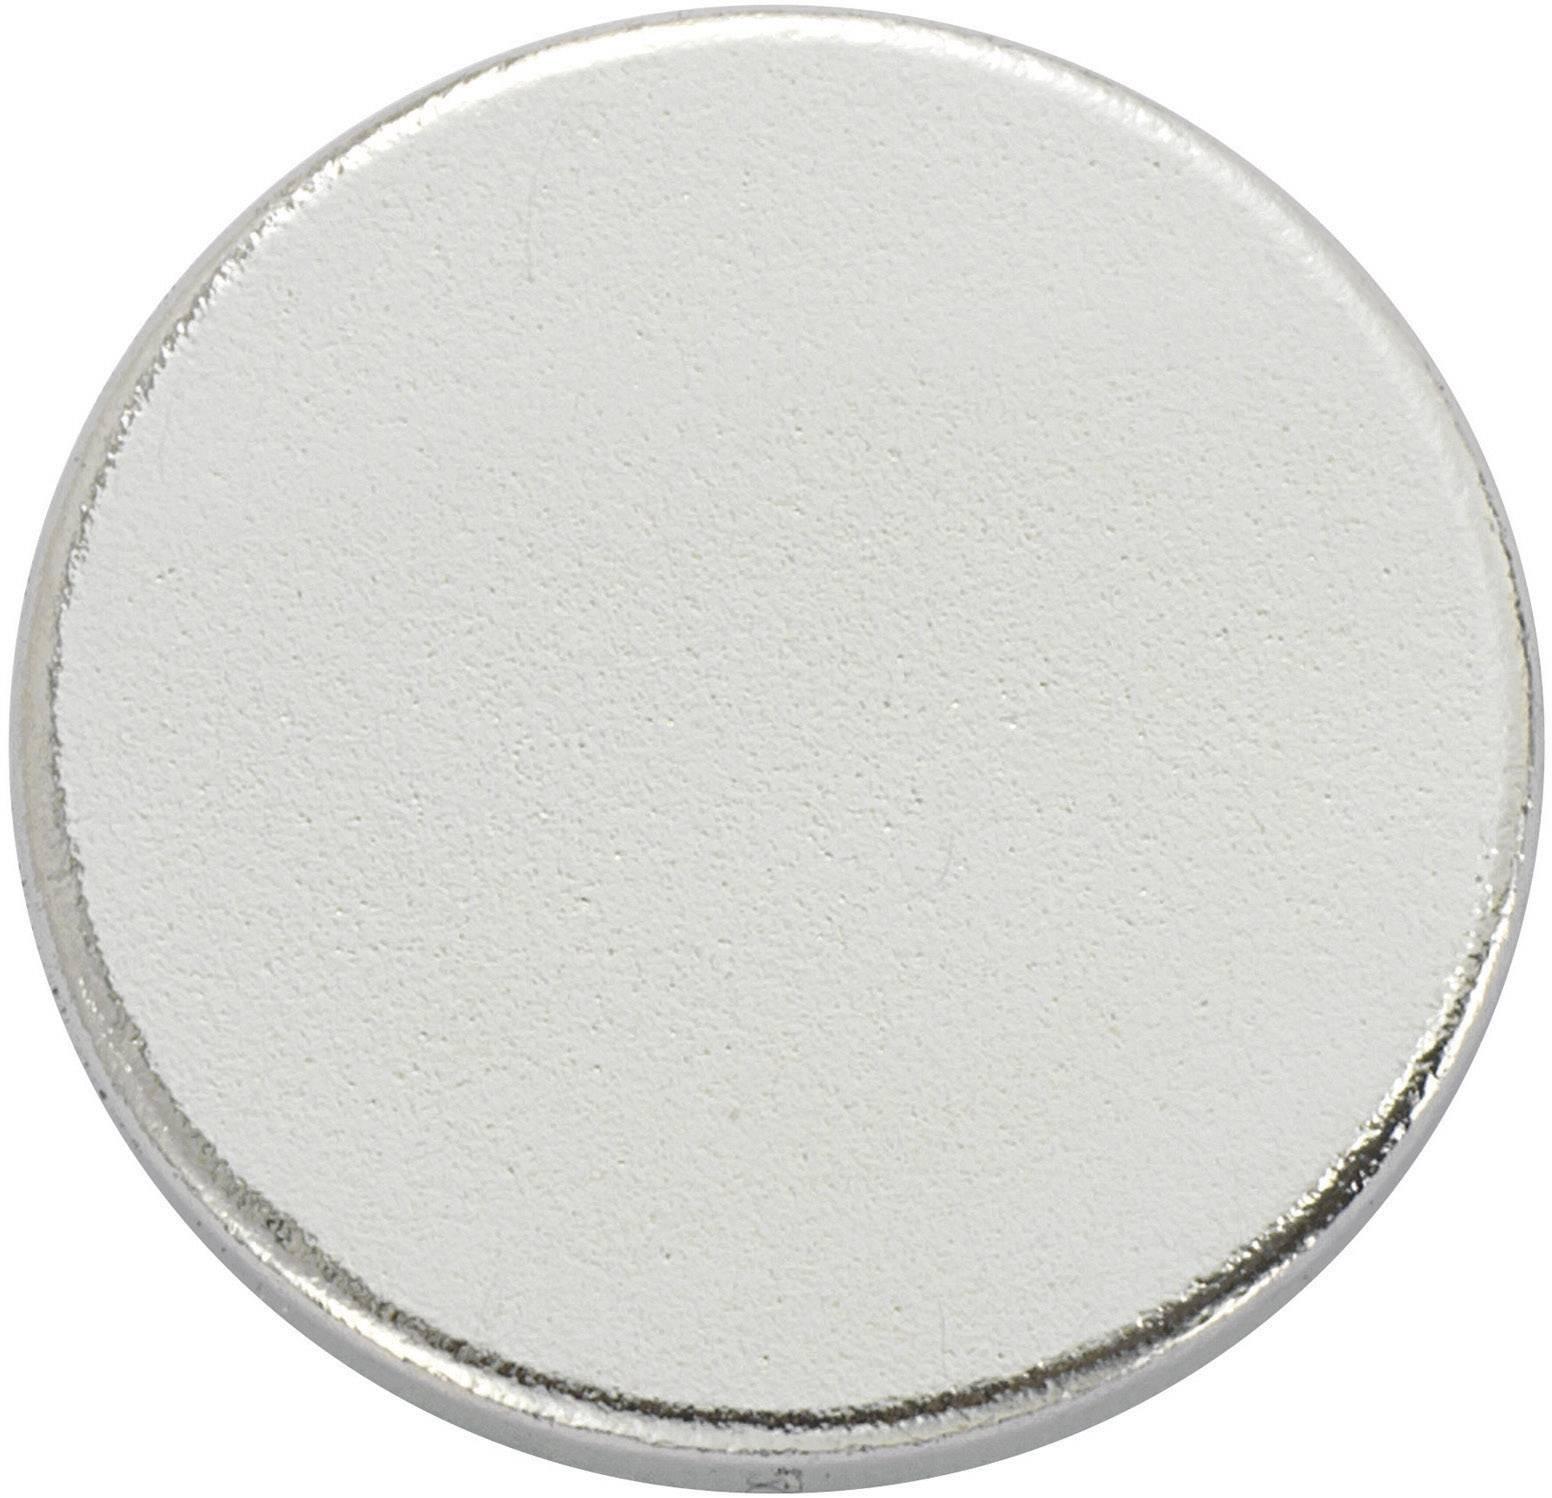 Samolepiace magnet TRU COMPONENTS N35-3502 1564100, (Ø) 15 mm, strieborná, 1 ks